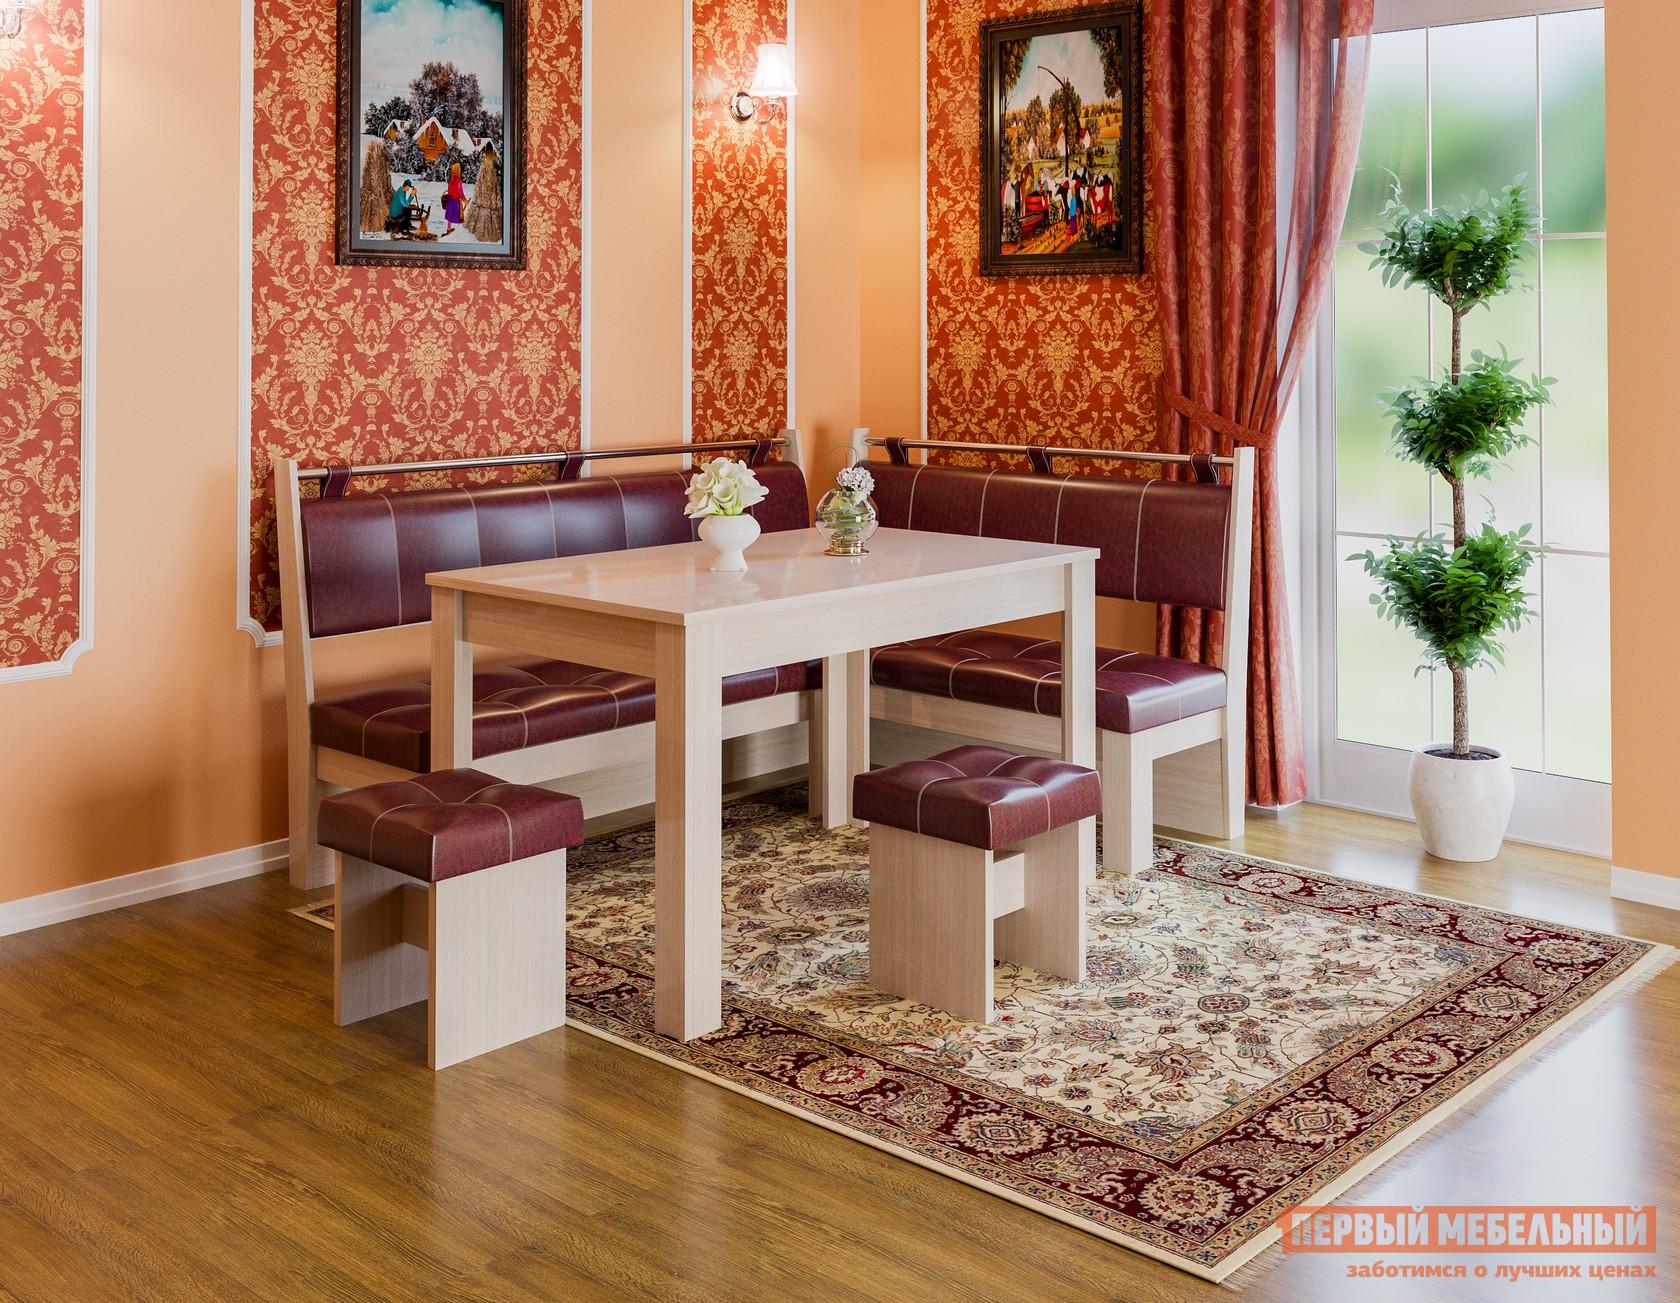 Кухонный уголок  Кухонный уголок Остин Дуб Белфорт, Бордо, экокожа — Кухонный уголок Остин Дуб Белфорт, Бордо, экокожа